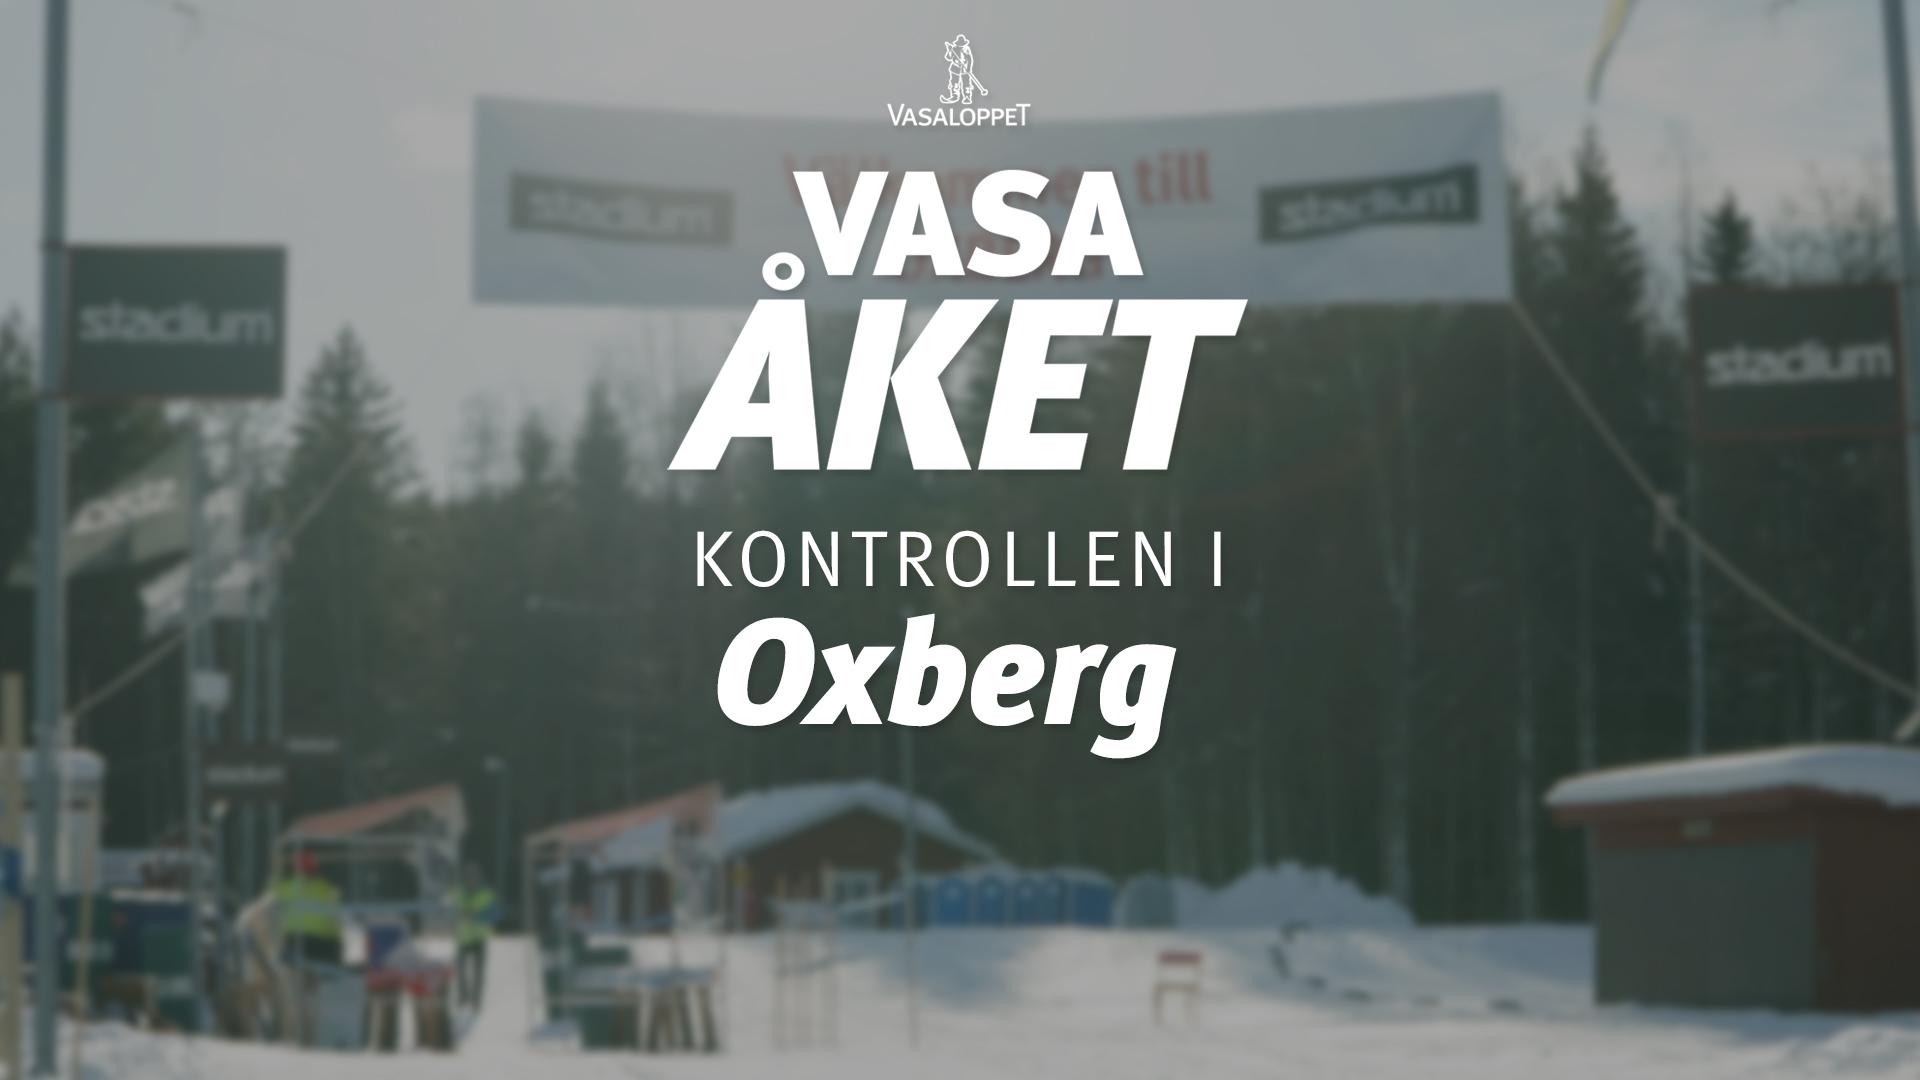 21 februari, 2021 – Oxberg